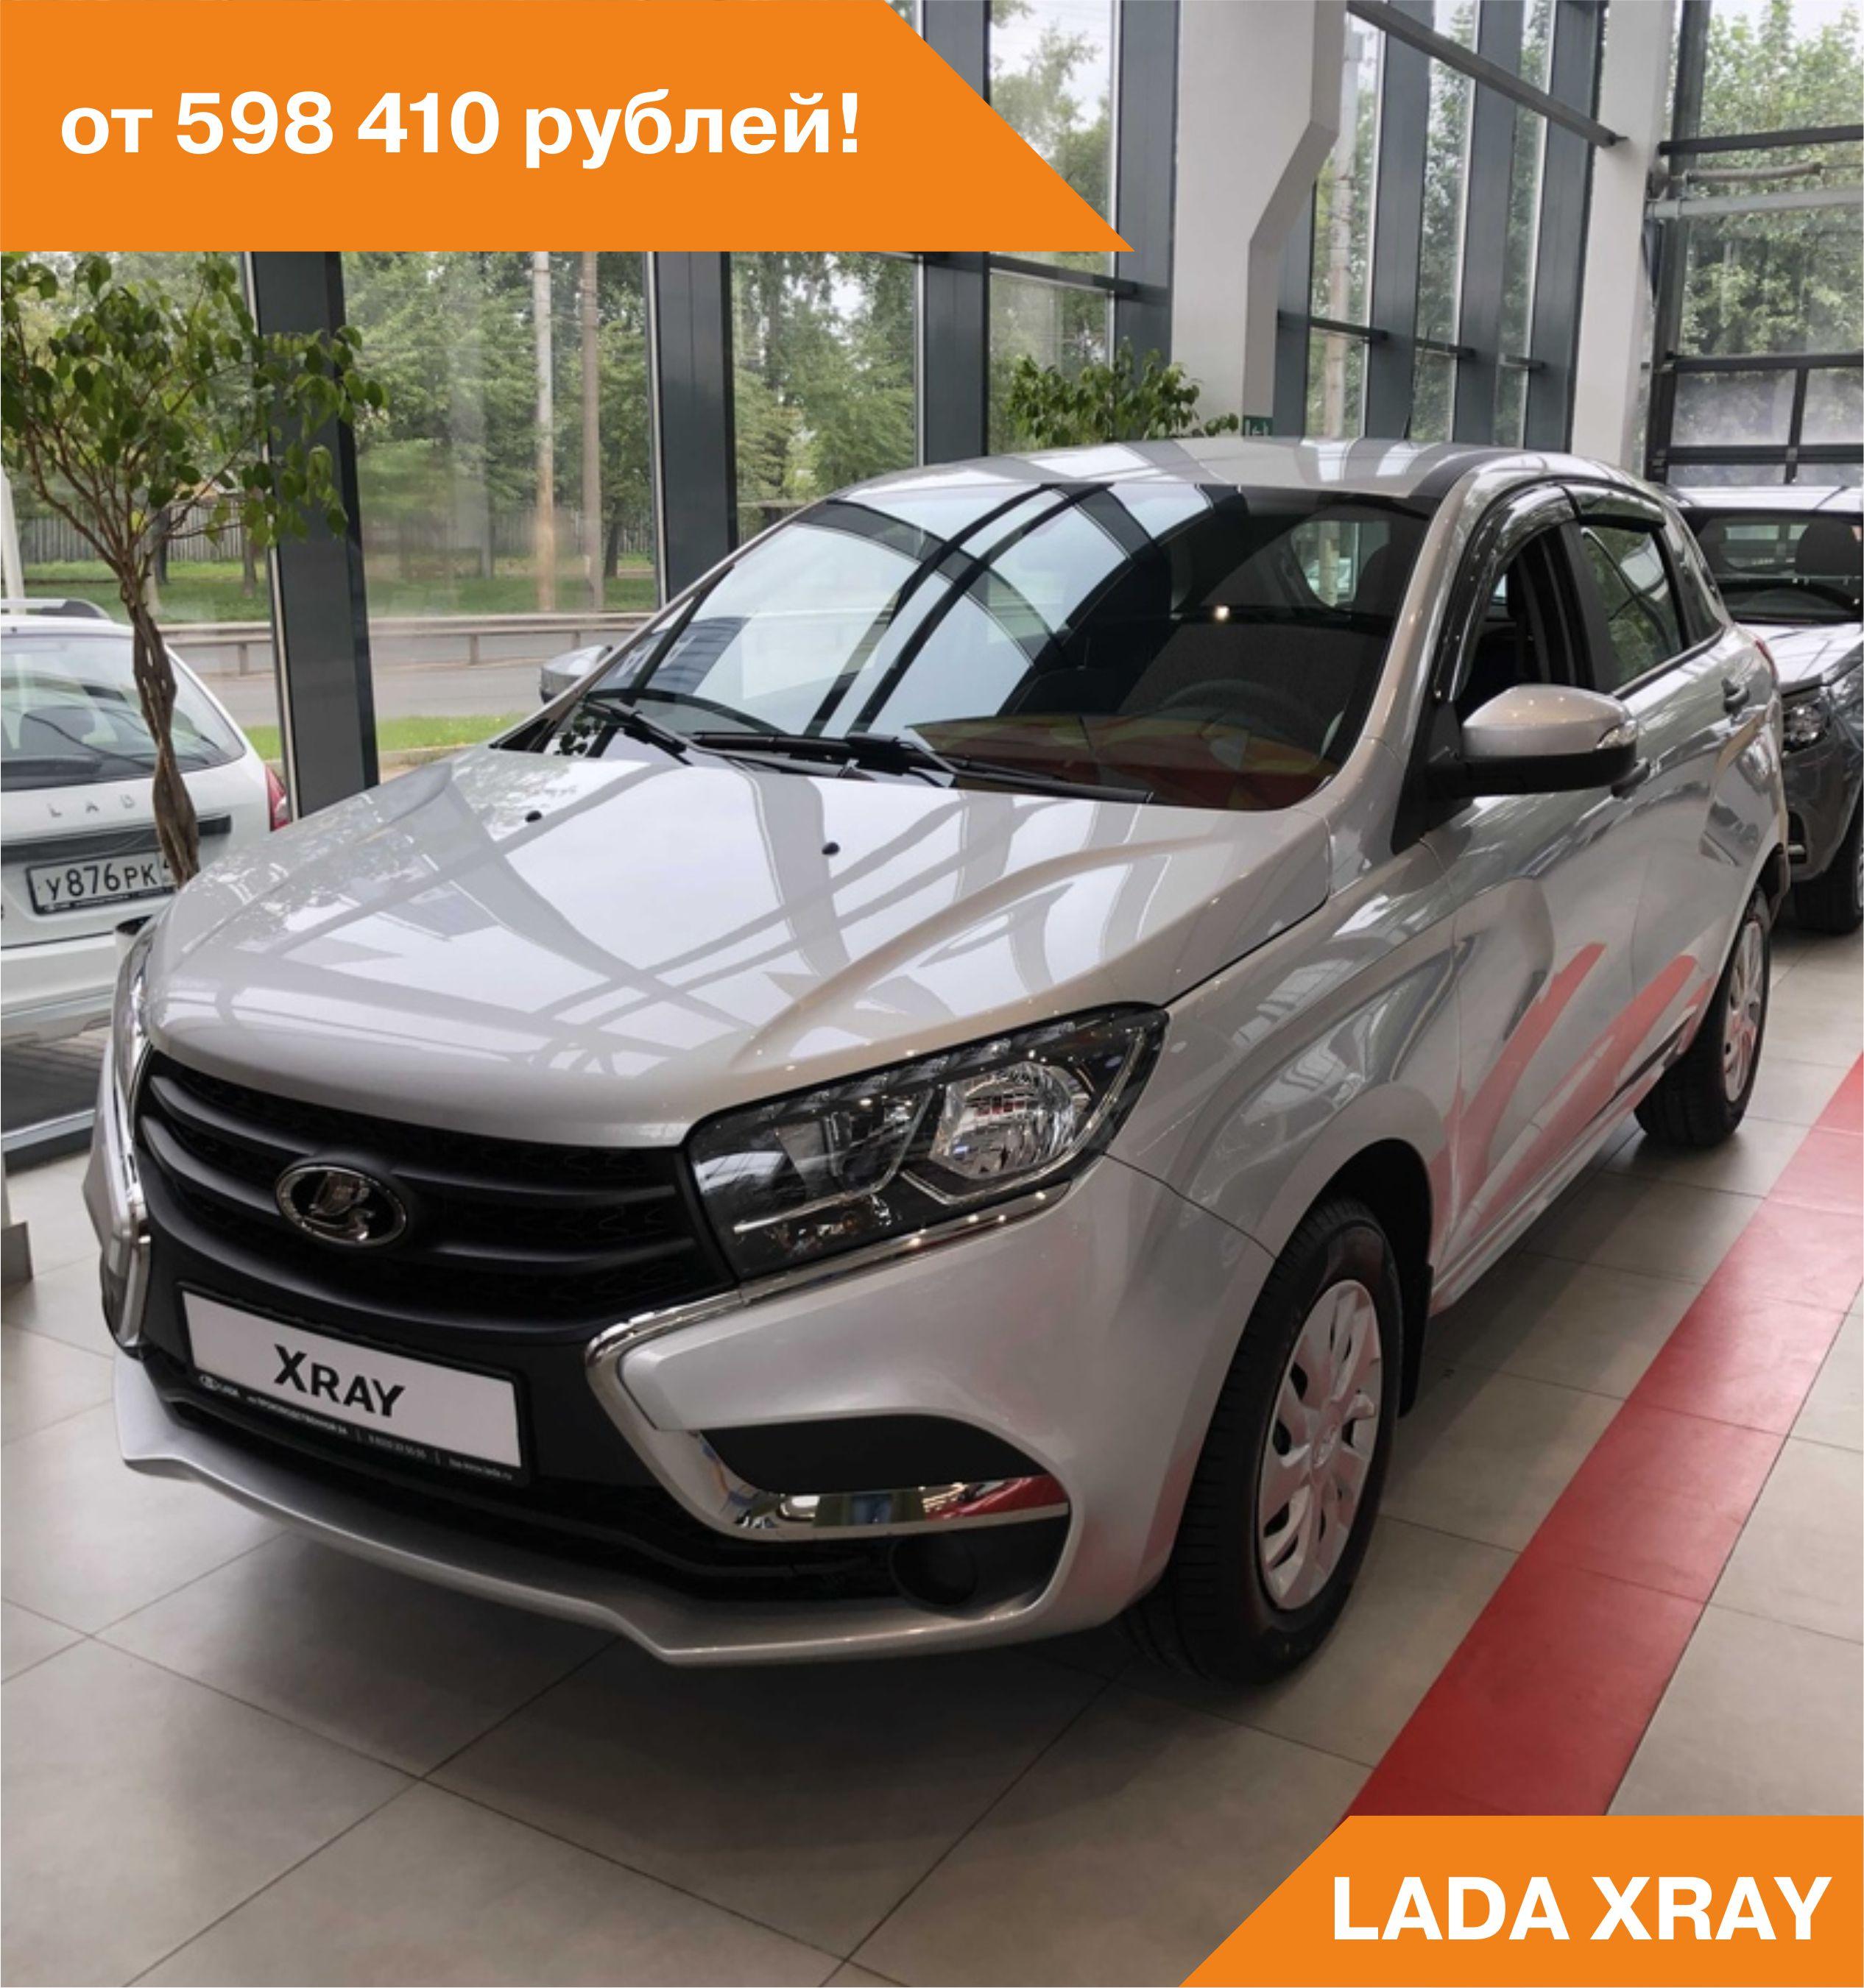 LADA Xray от 598 410 рублей!